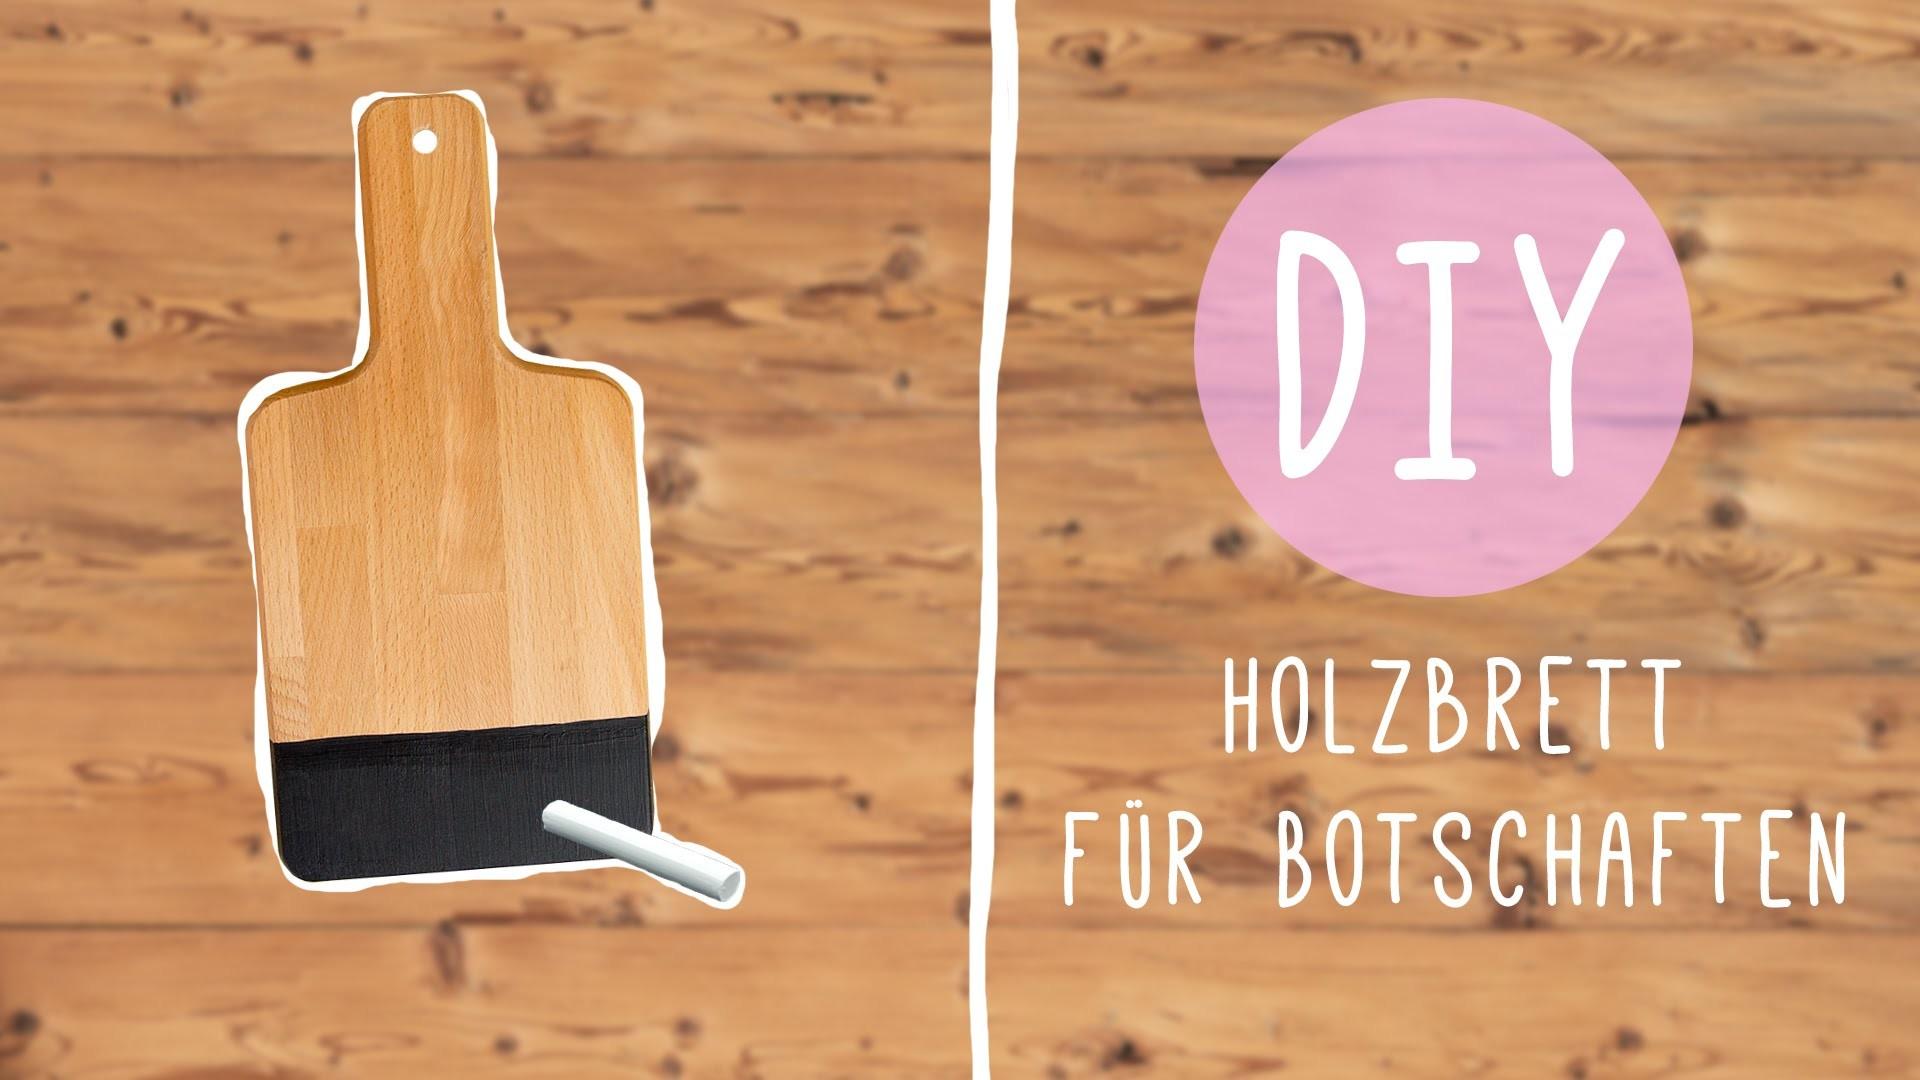 DIY mit Nina: Holzbrett mit süßen Botschaften